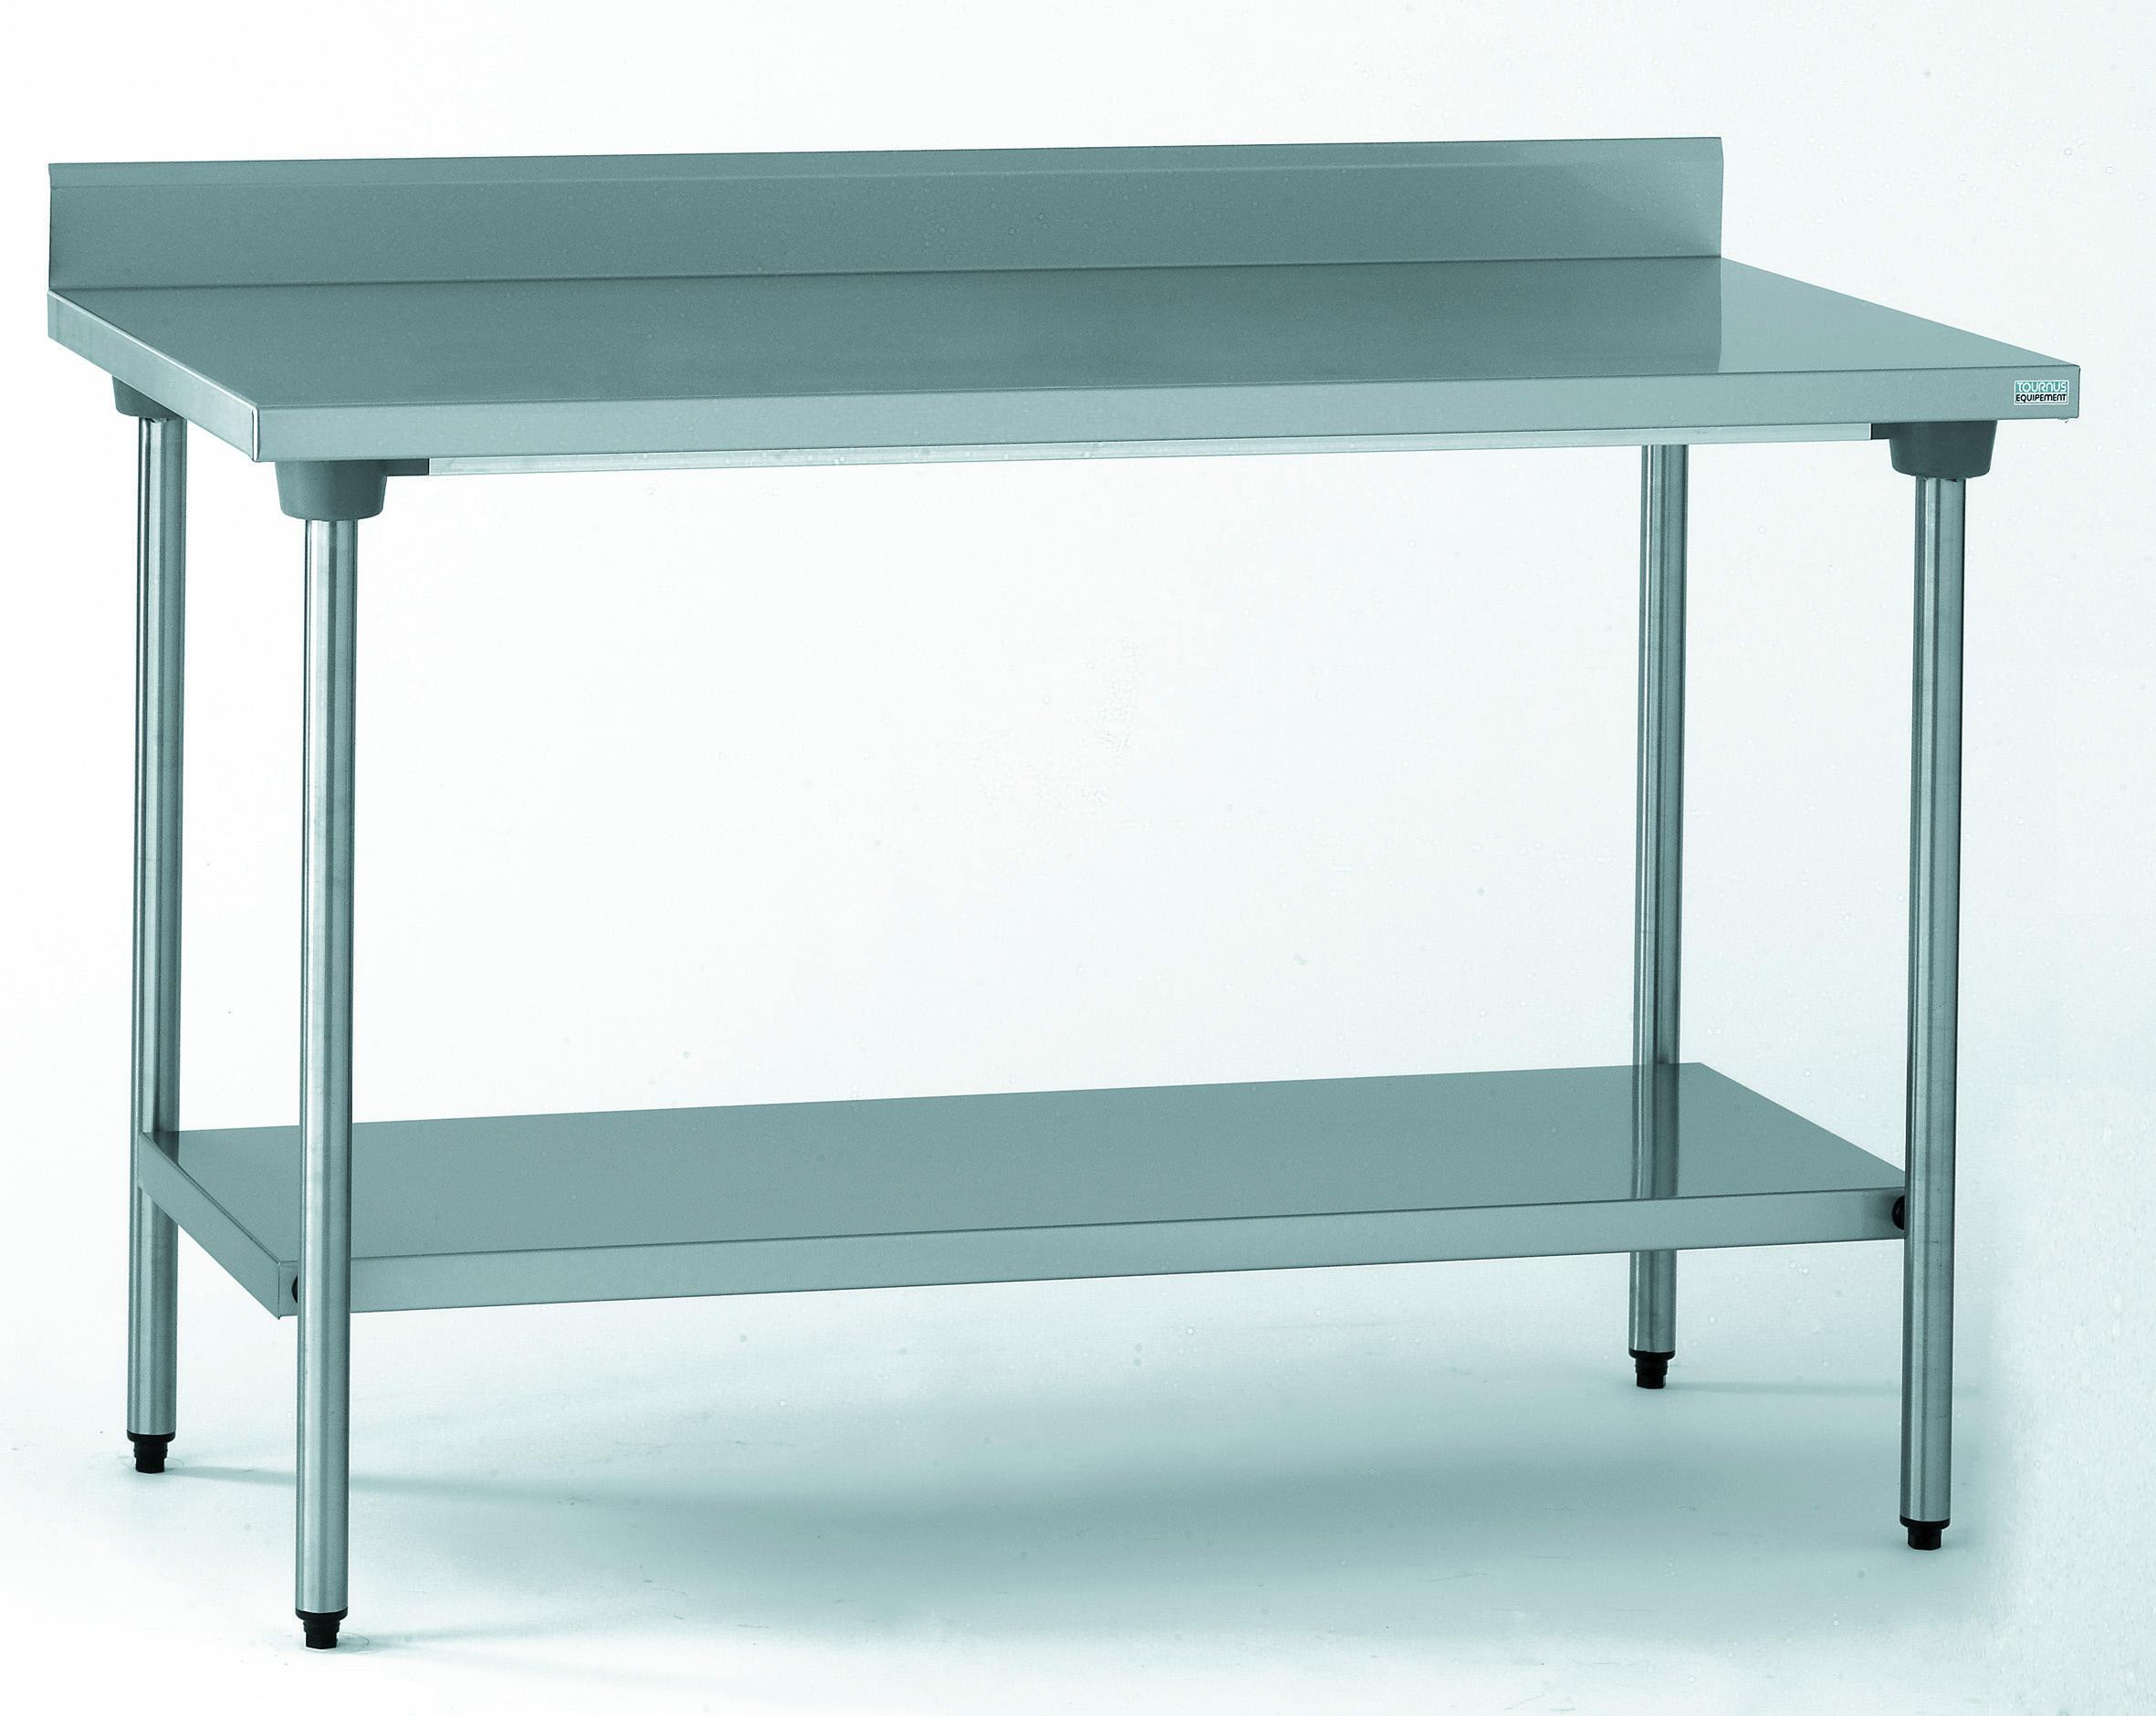 TABLE CHR ADOS+ETAG. 700X1200